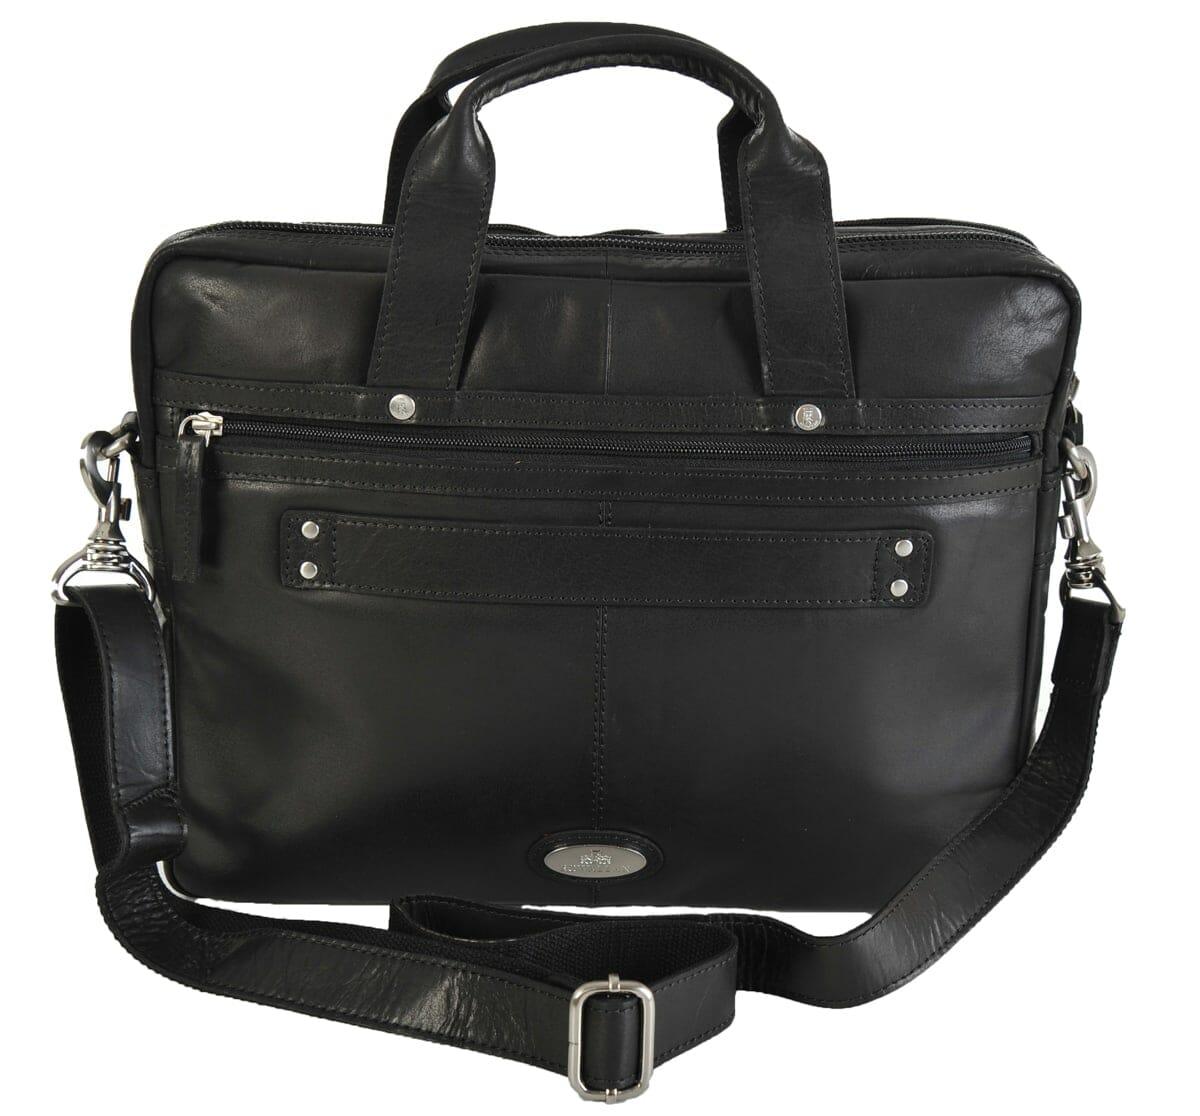 cd0633862e9e Rowallan Black Leather Two Section Work Bag 32-1283 - David Viggers ...